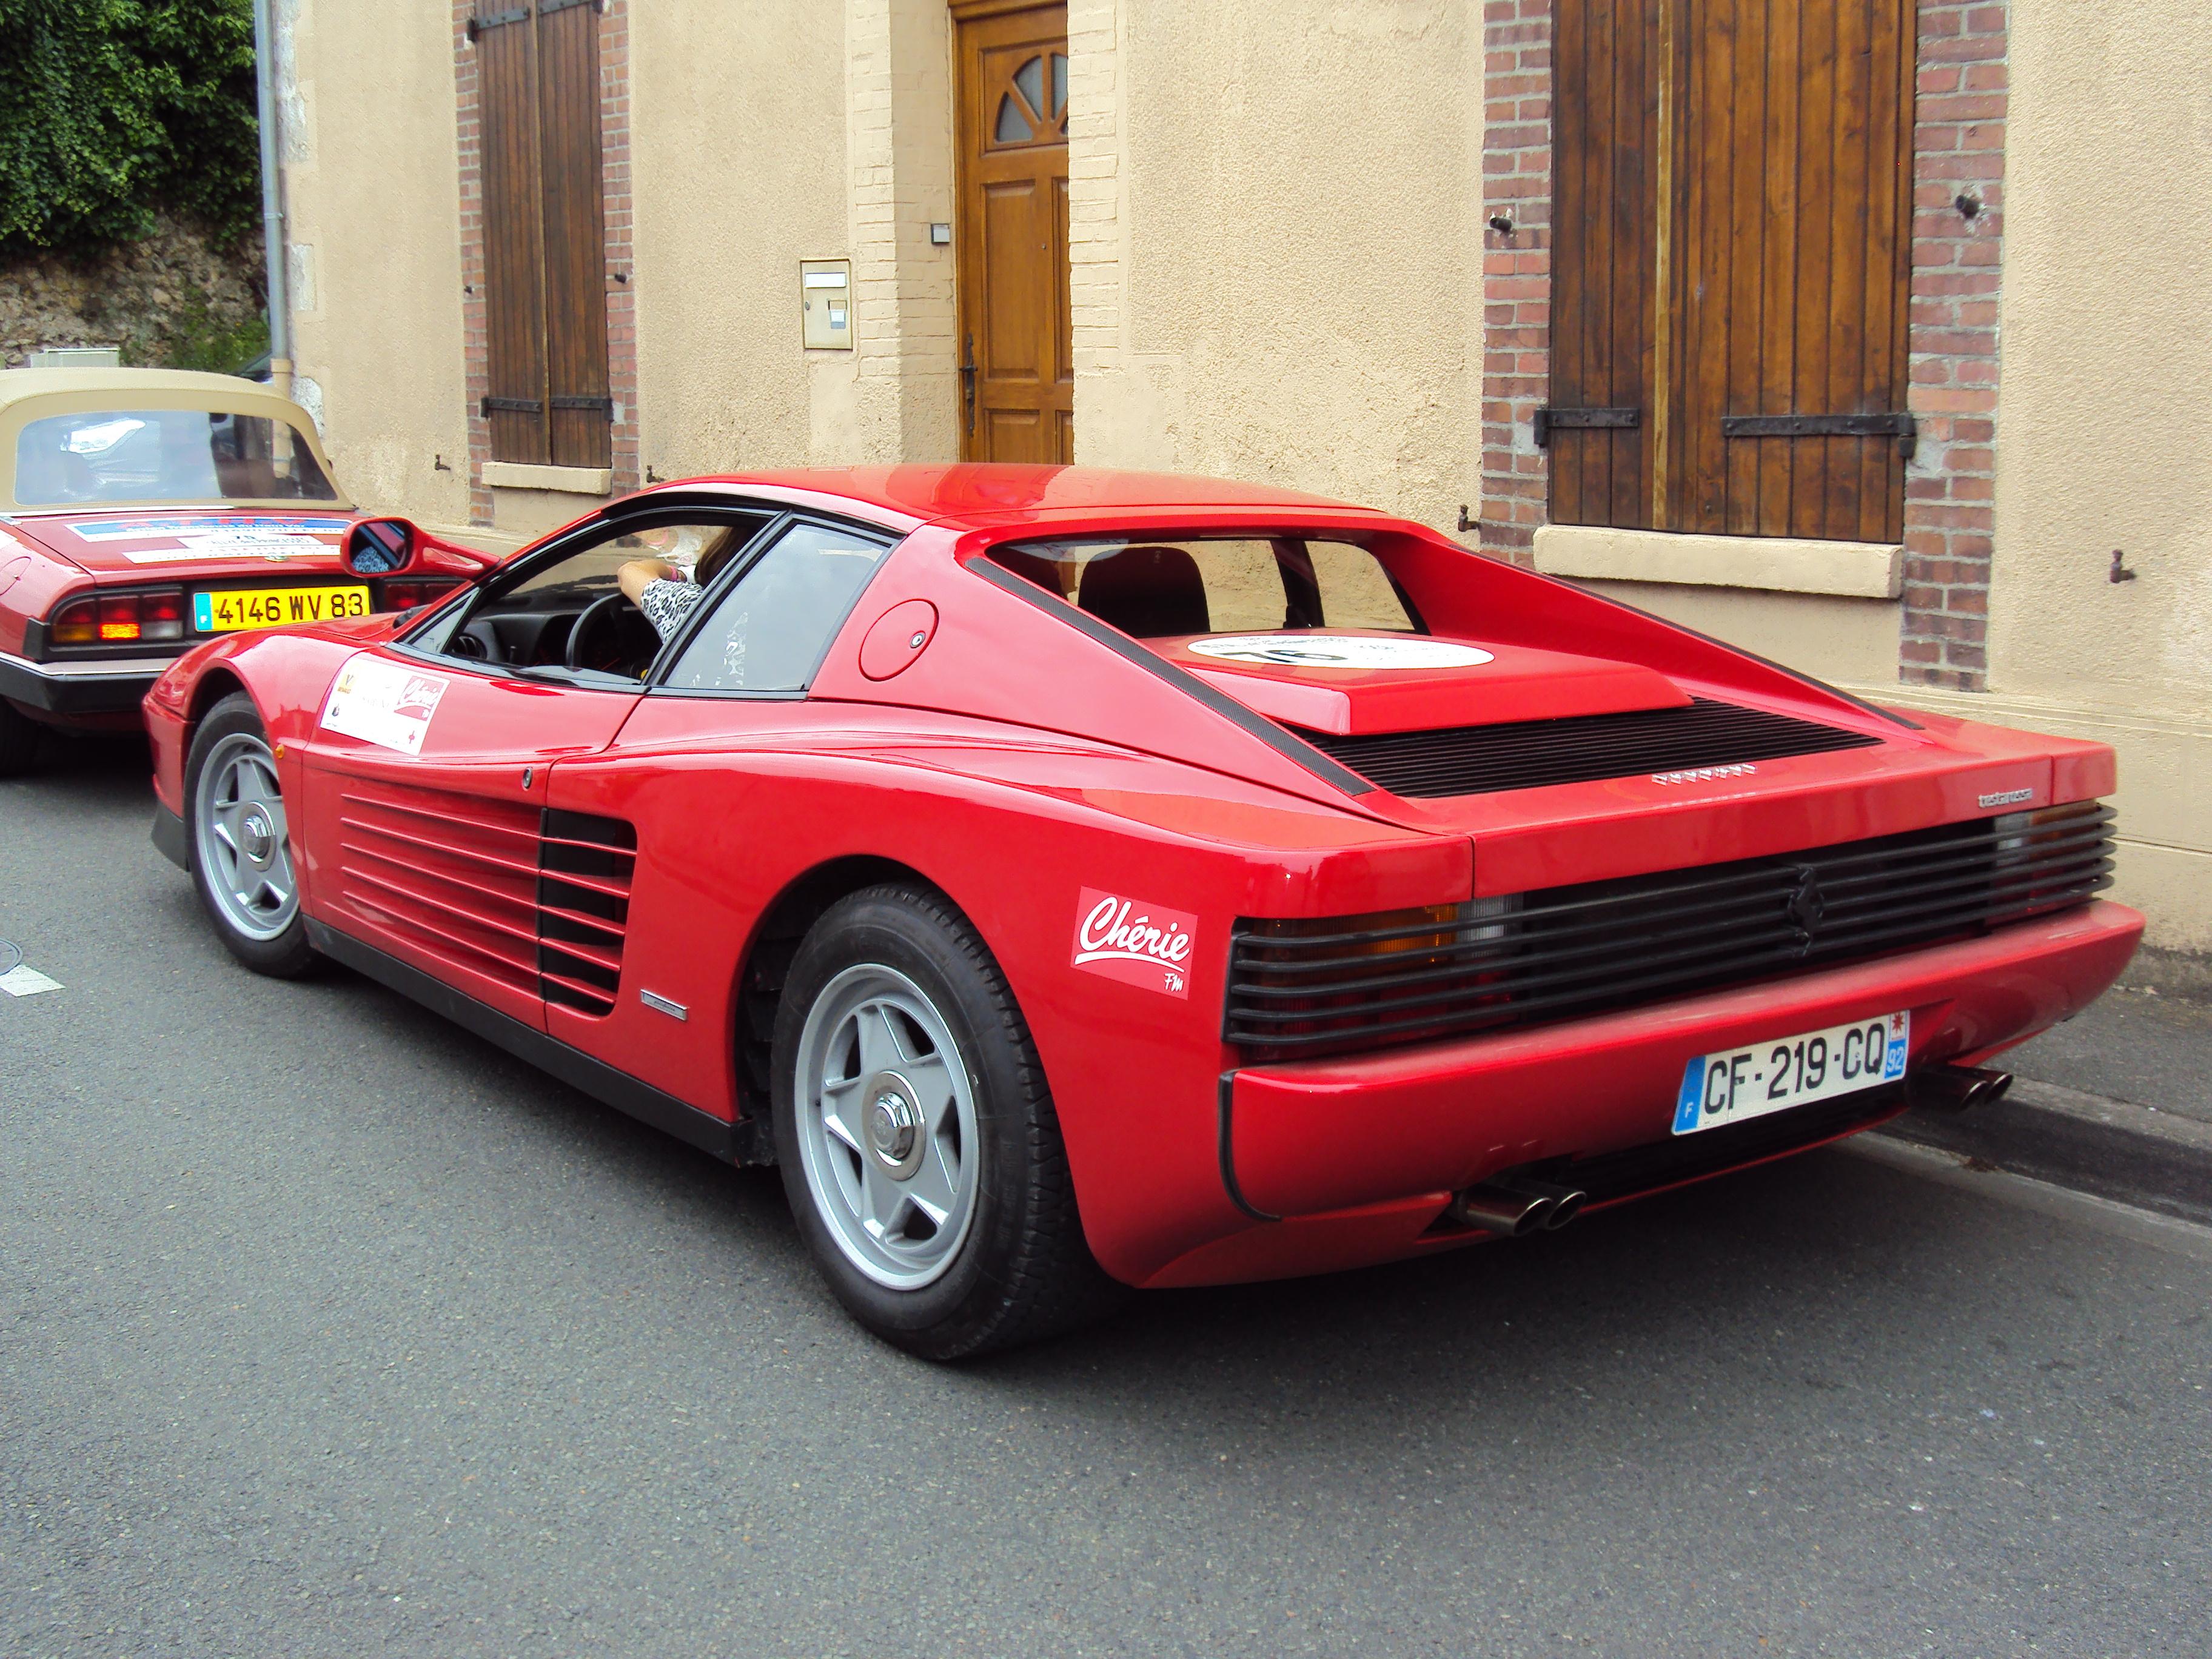 File Ferrari Testarossa 1984 Rallye Des Princesses 2014 Jpg Wikimedia Commons